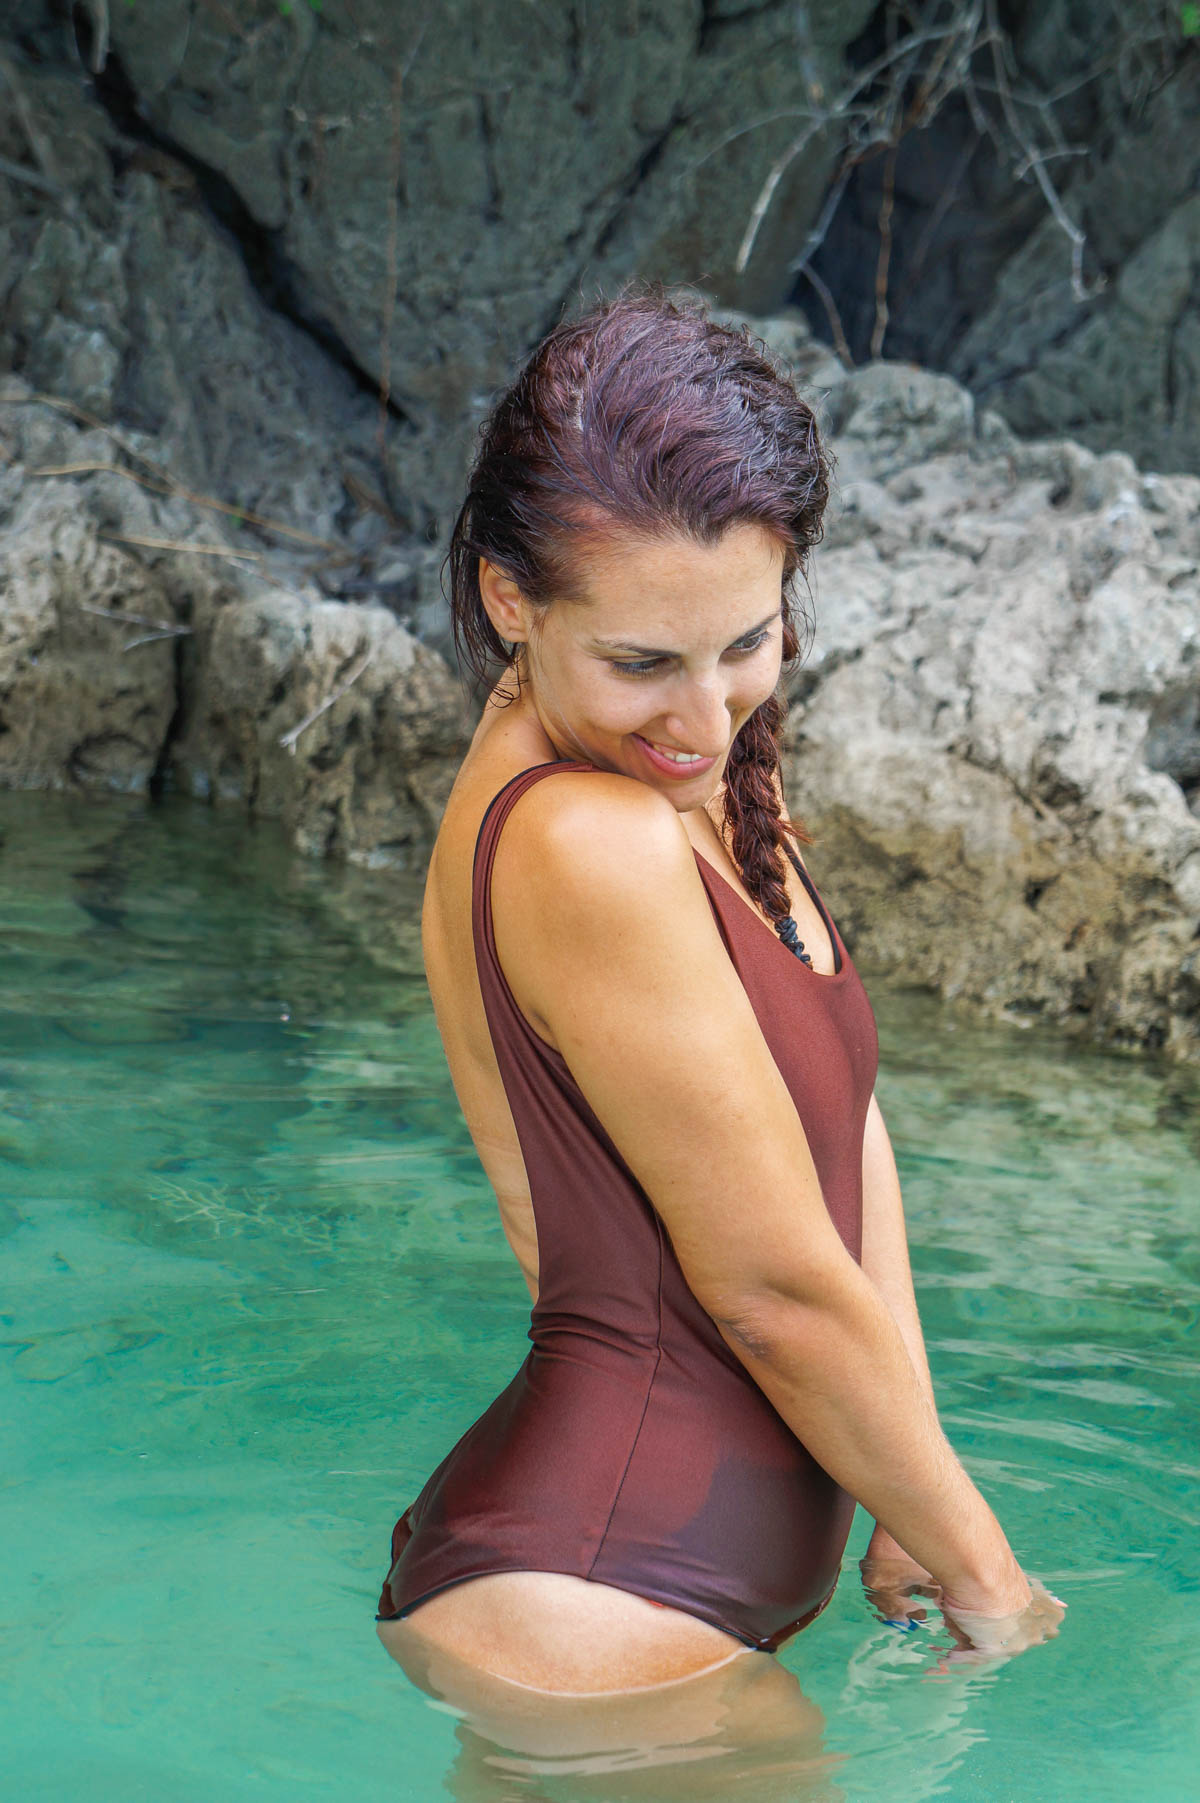 kourna-lake-crete-greece-la-vie-en-blog-all-rights-reserved-17